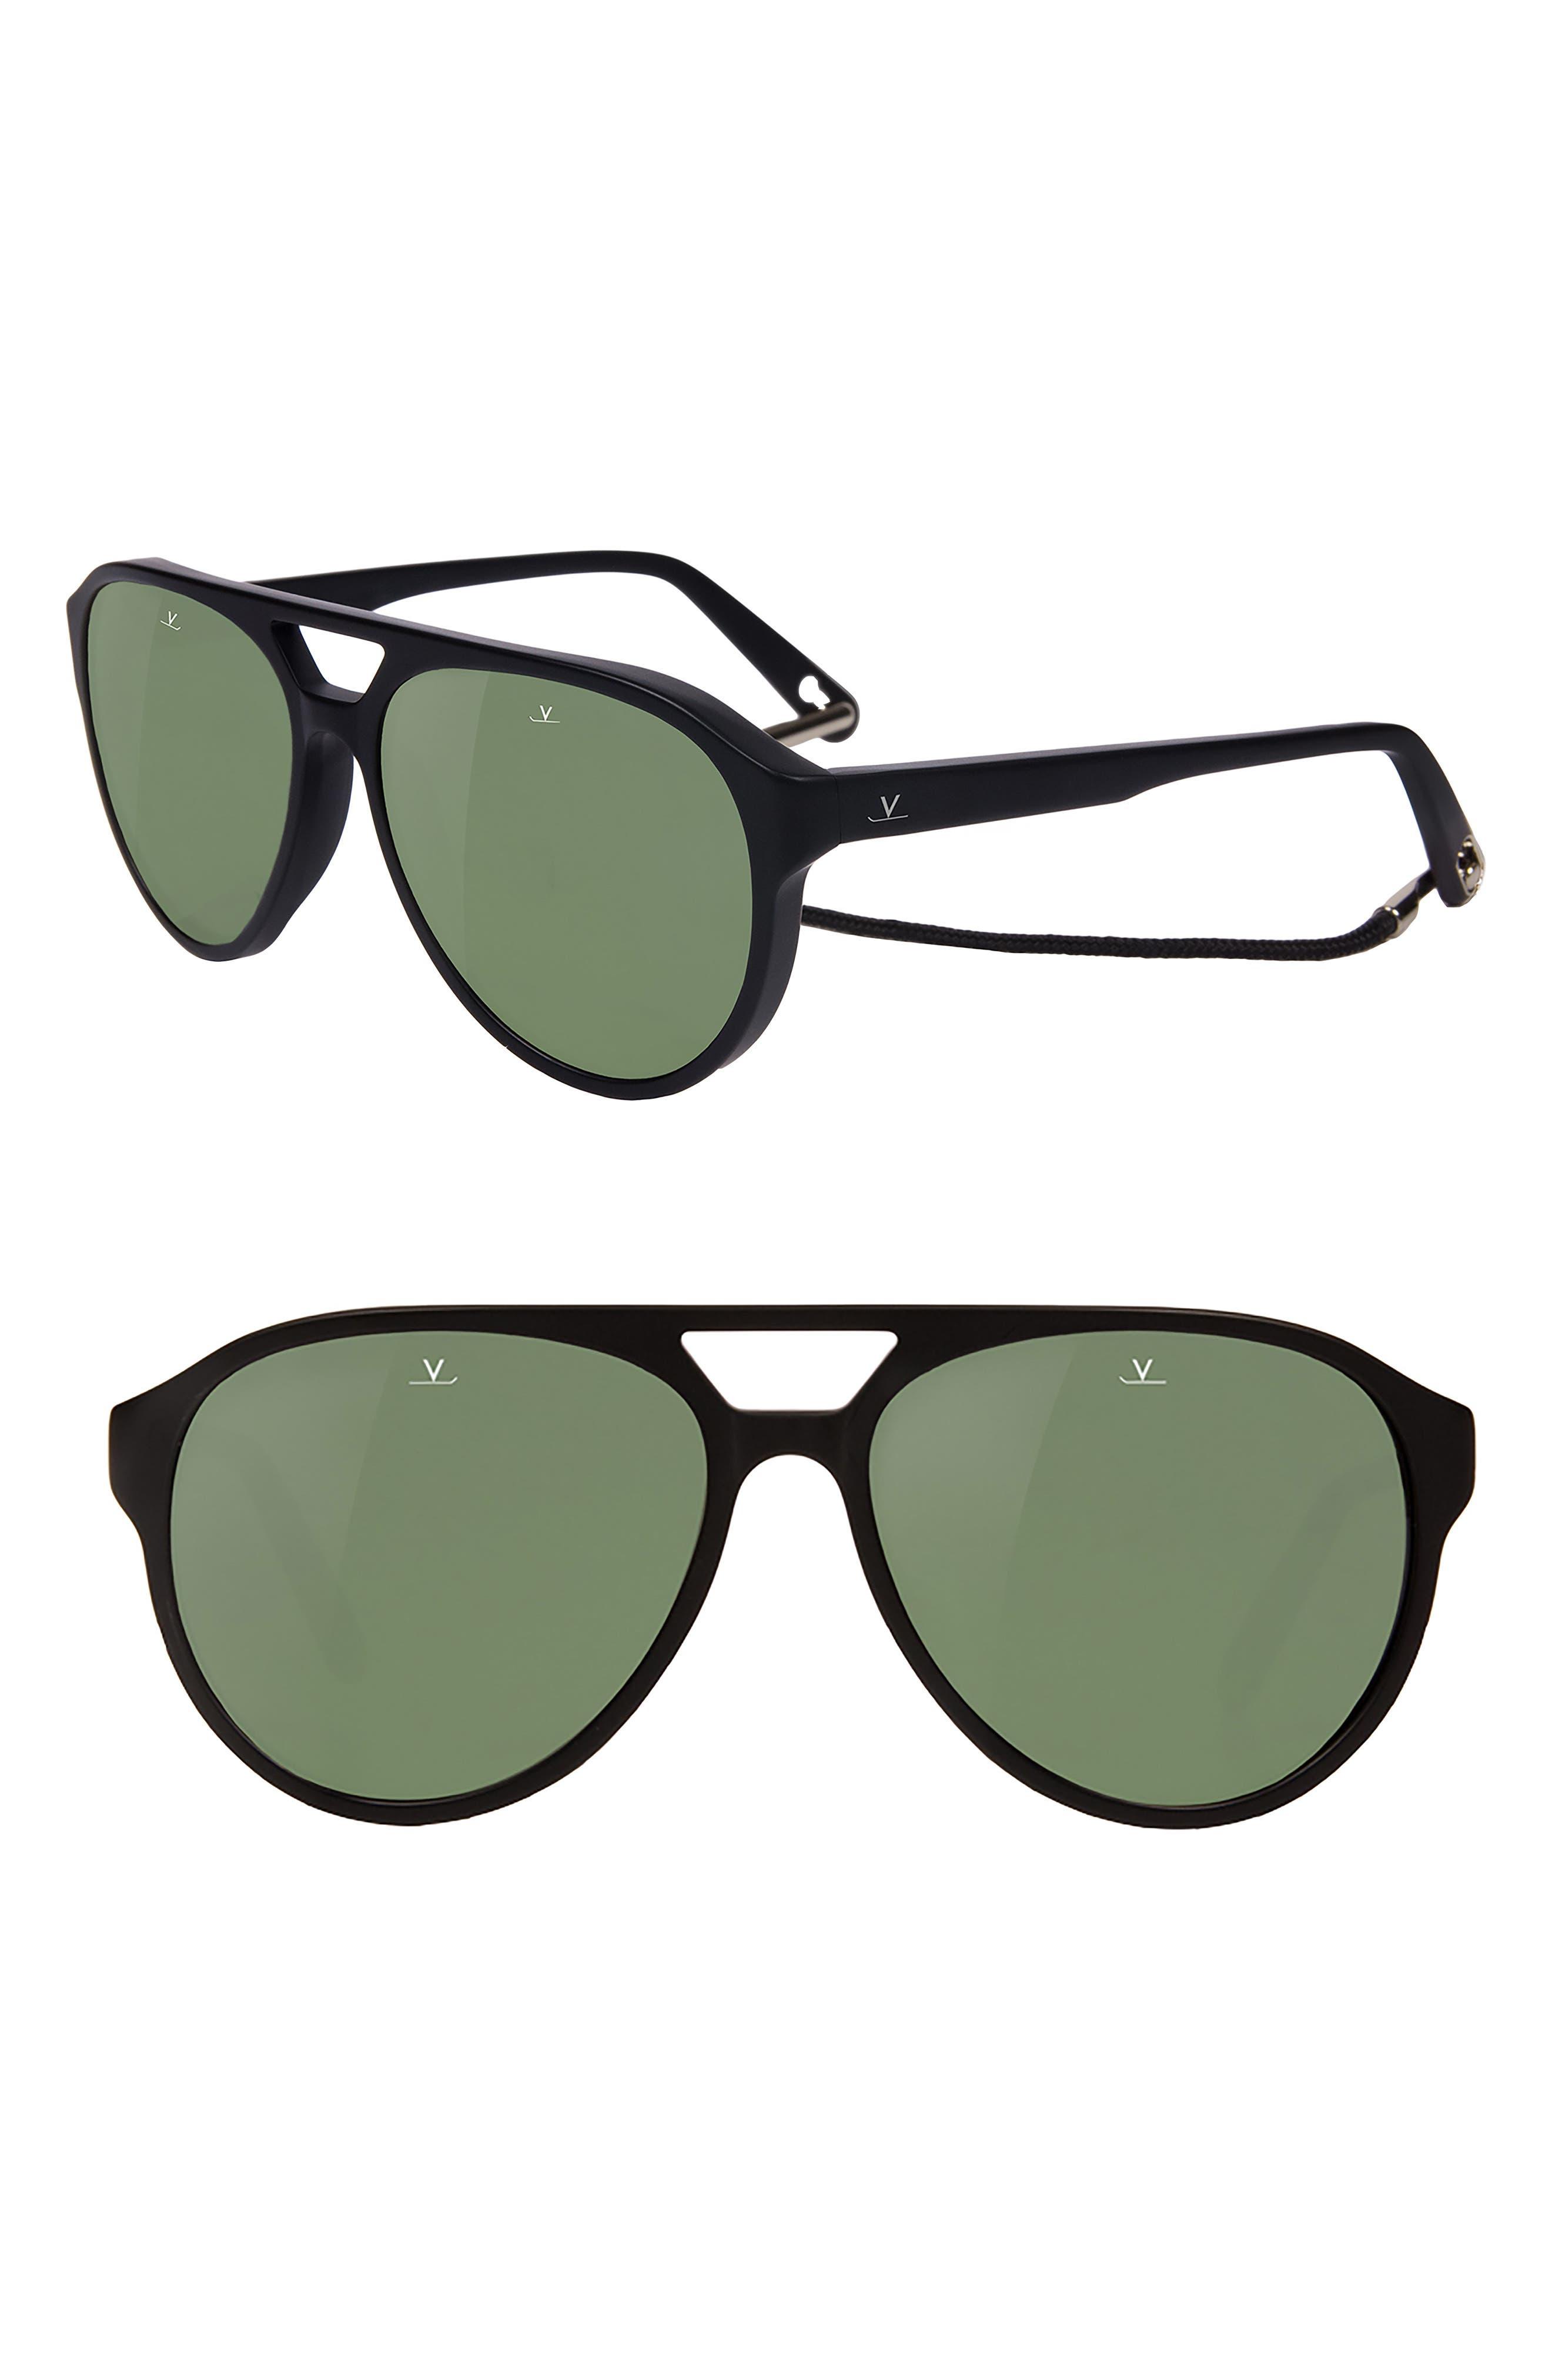 Tom 64mm Sunglasses,                             Main thumbnail 1, color,                             008